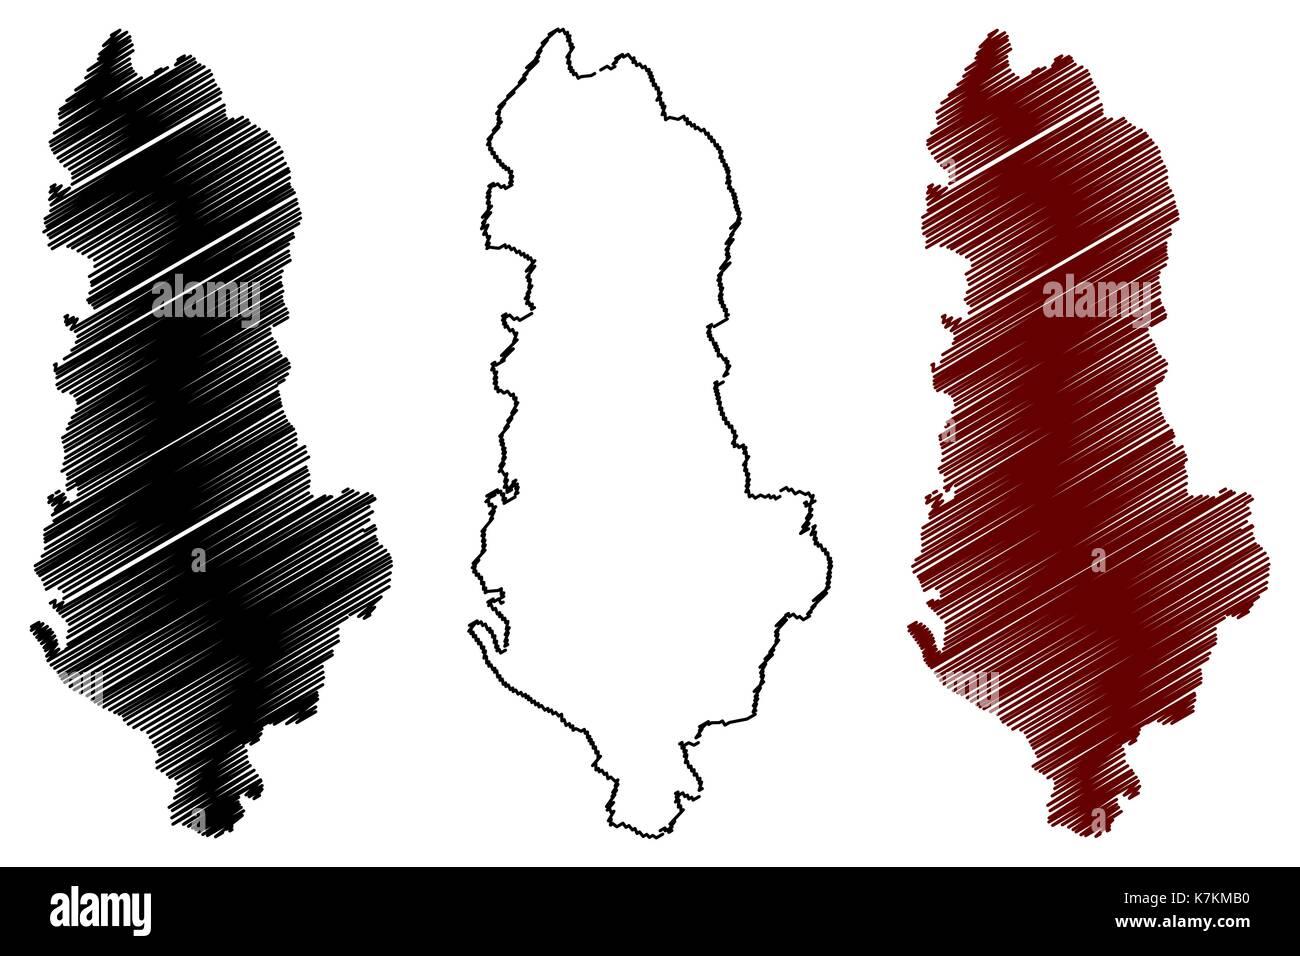 Albania map vector illustration, scribble sketch Albania - Stock Vector